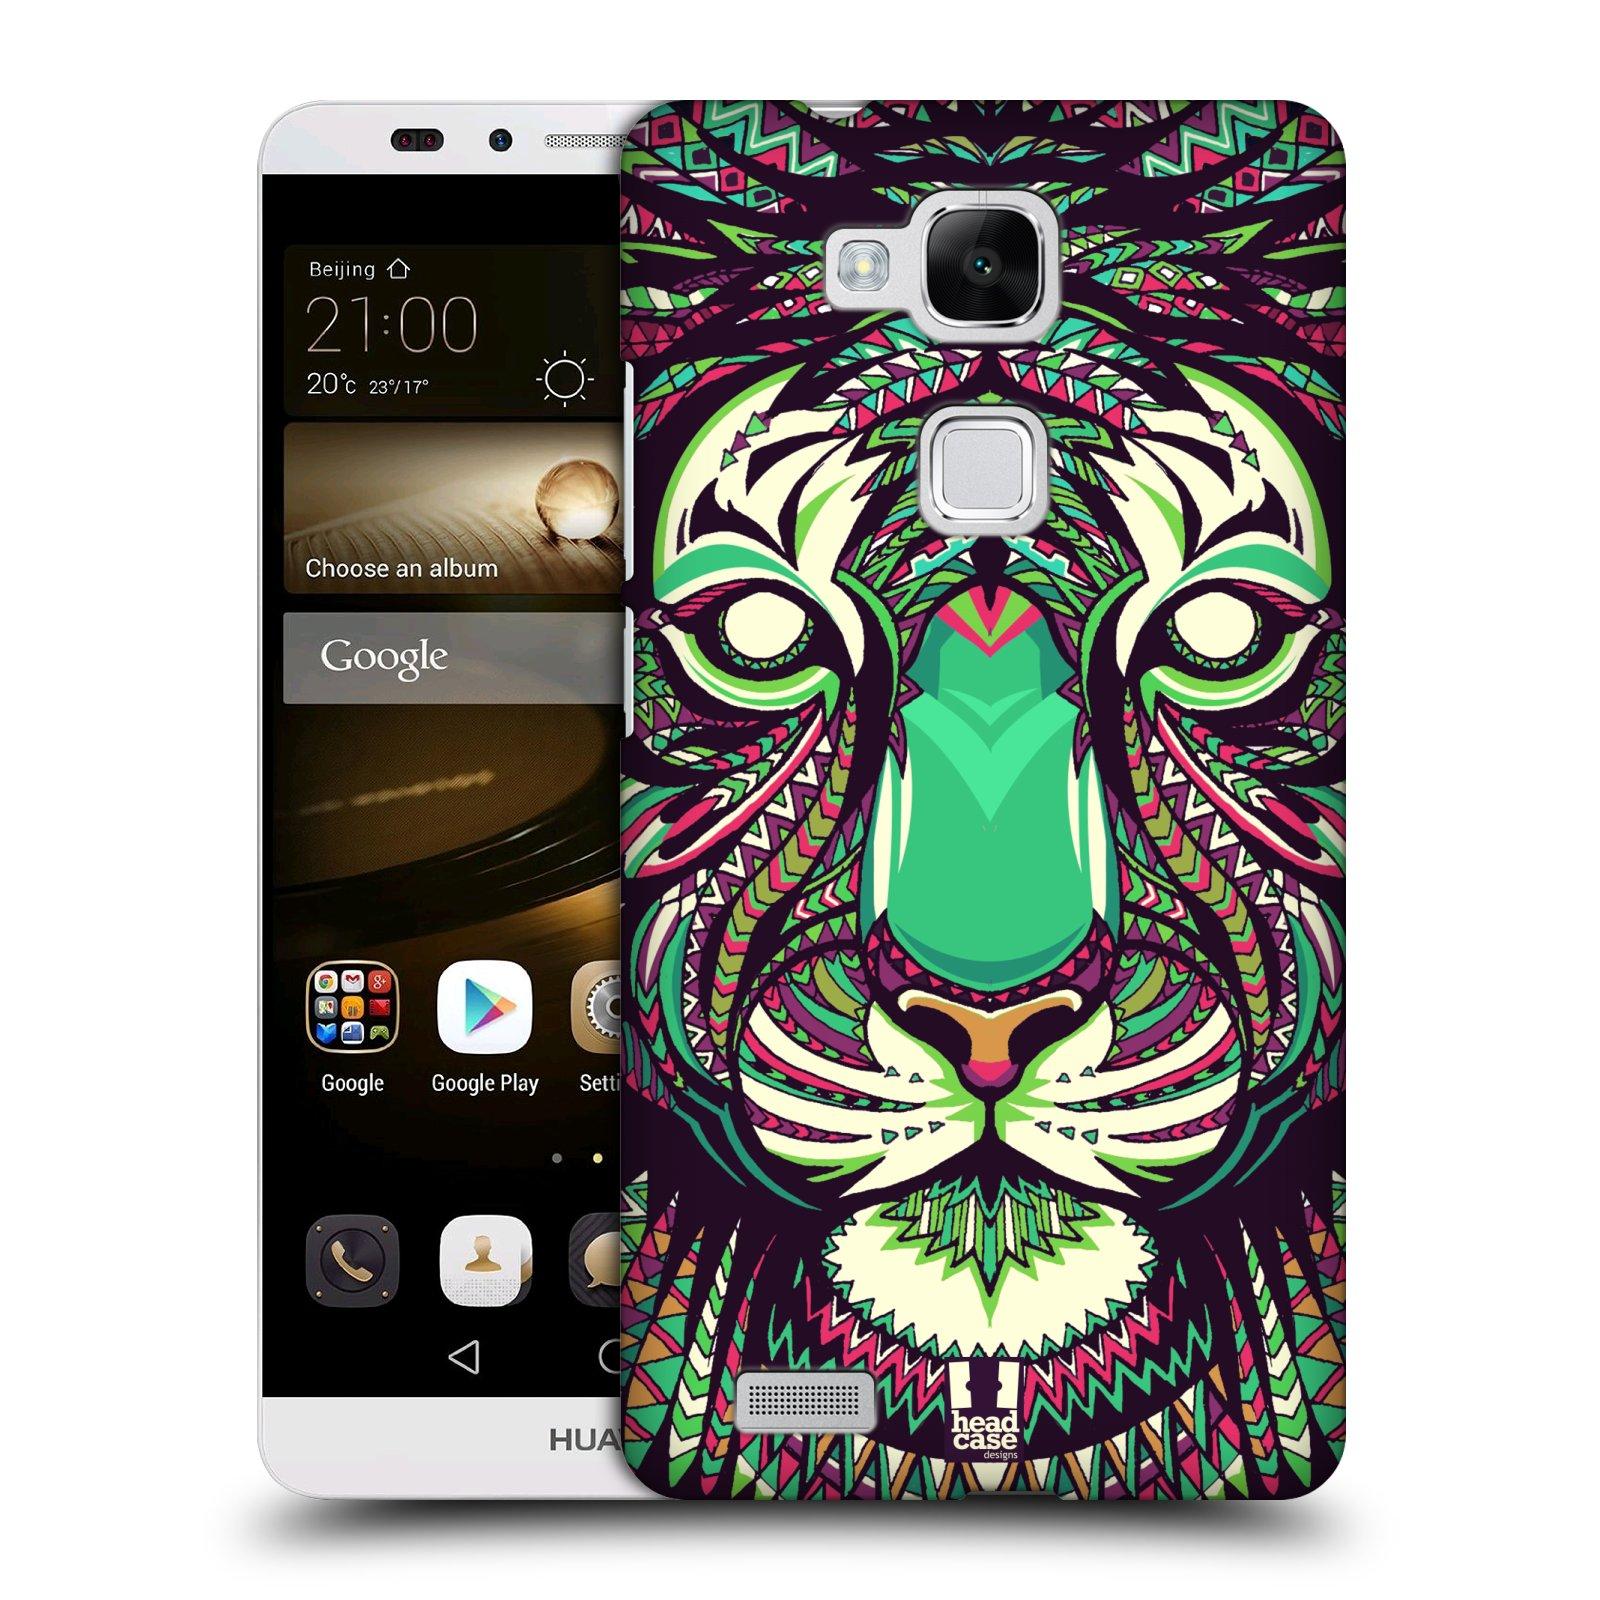 HEAD CASE plastový obal na mobil Huawei Mate 7 vzor Aztécký motiv zvíře 2 tygr